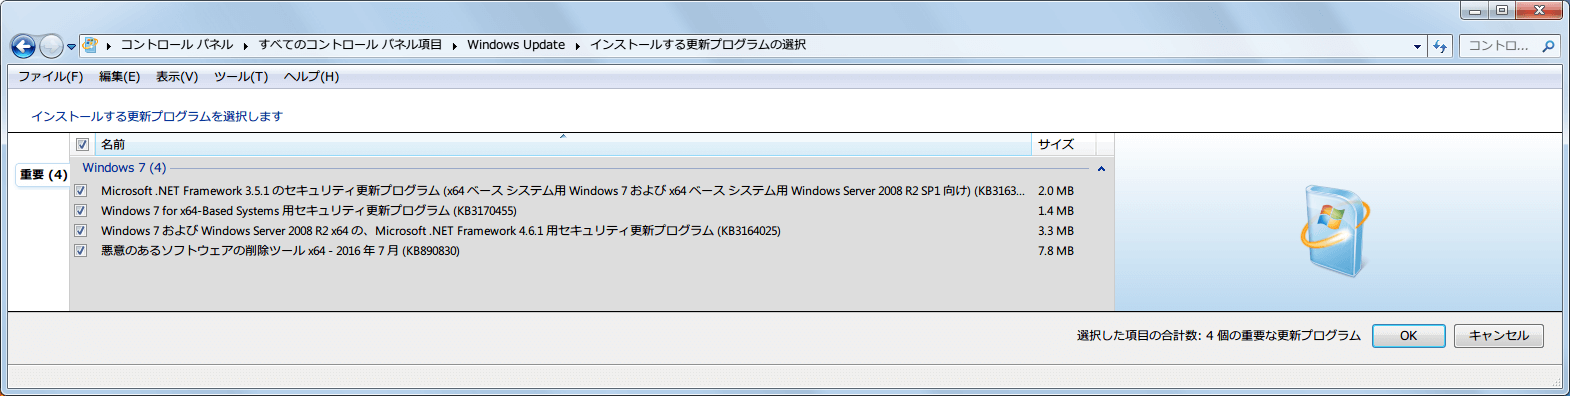 Windows 7 64bit Windows Update 重要 2016年7月公開分更新プログラムインストール